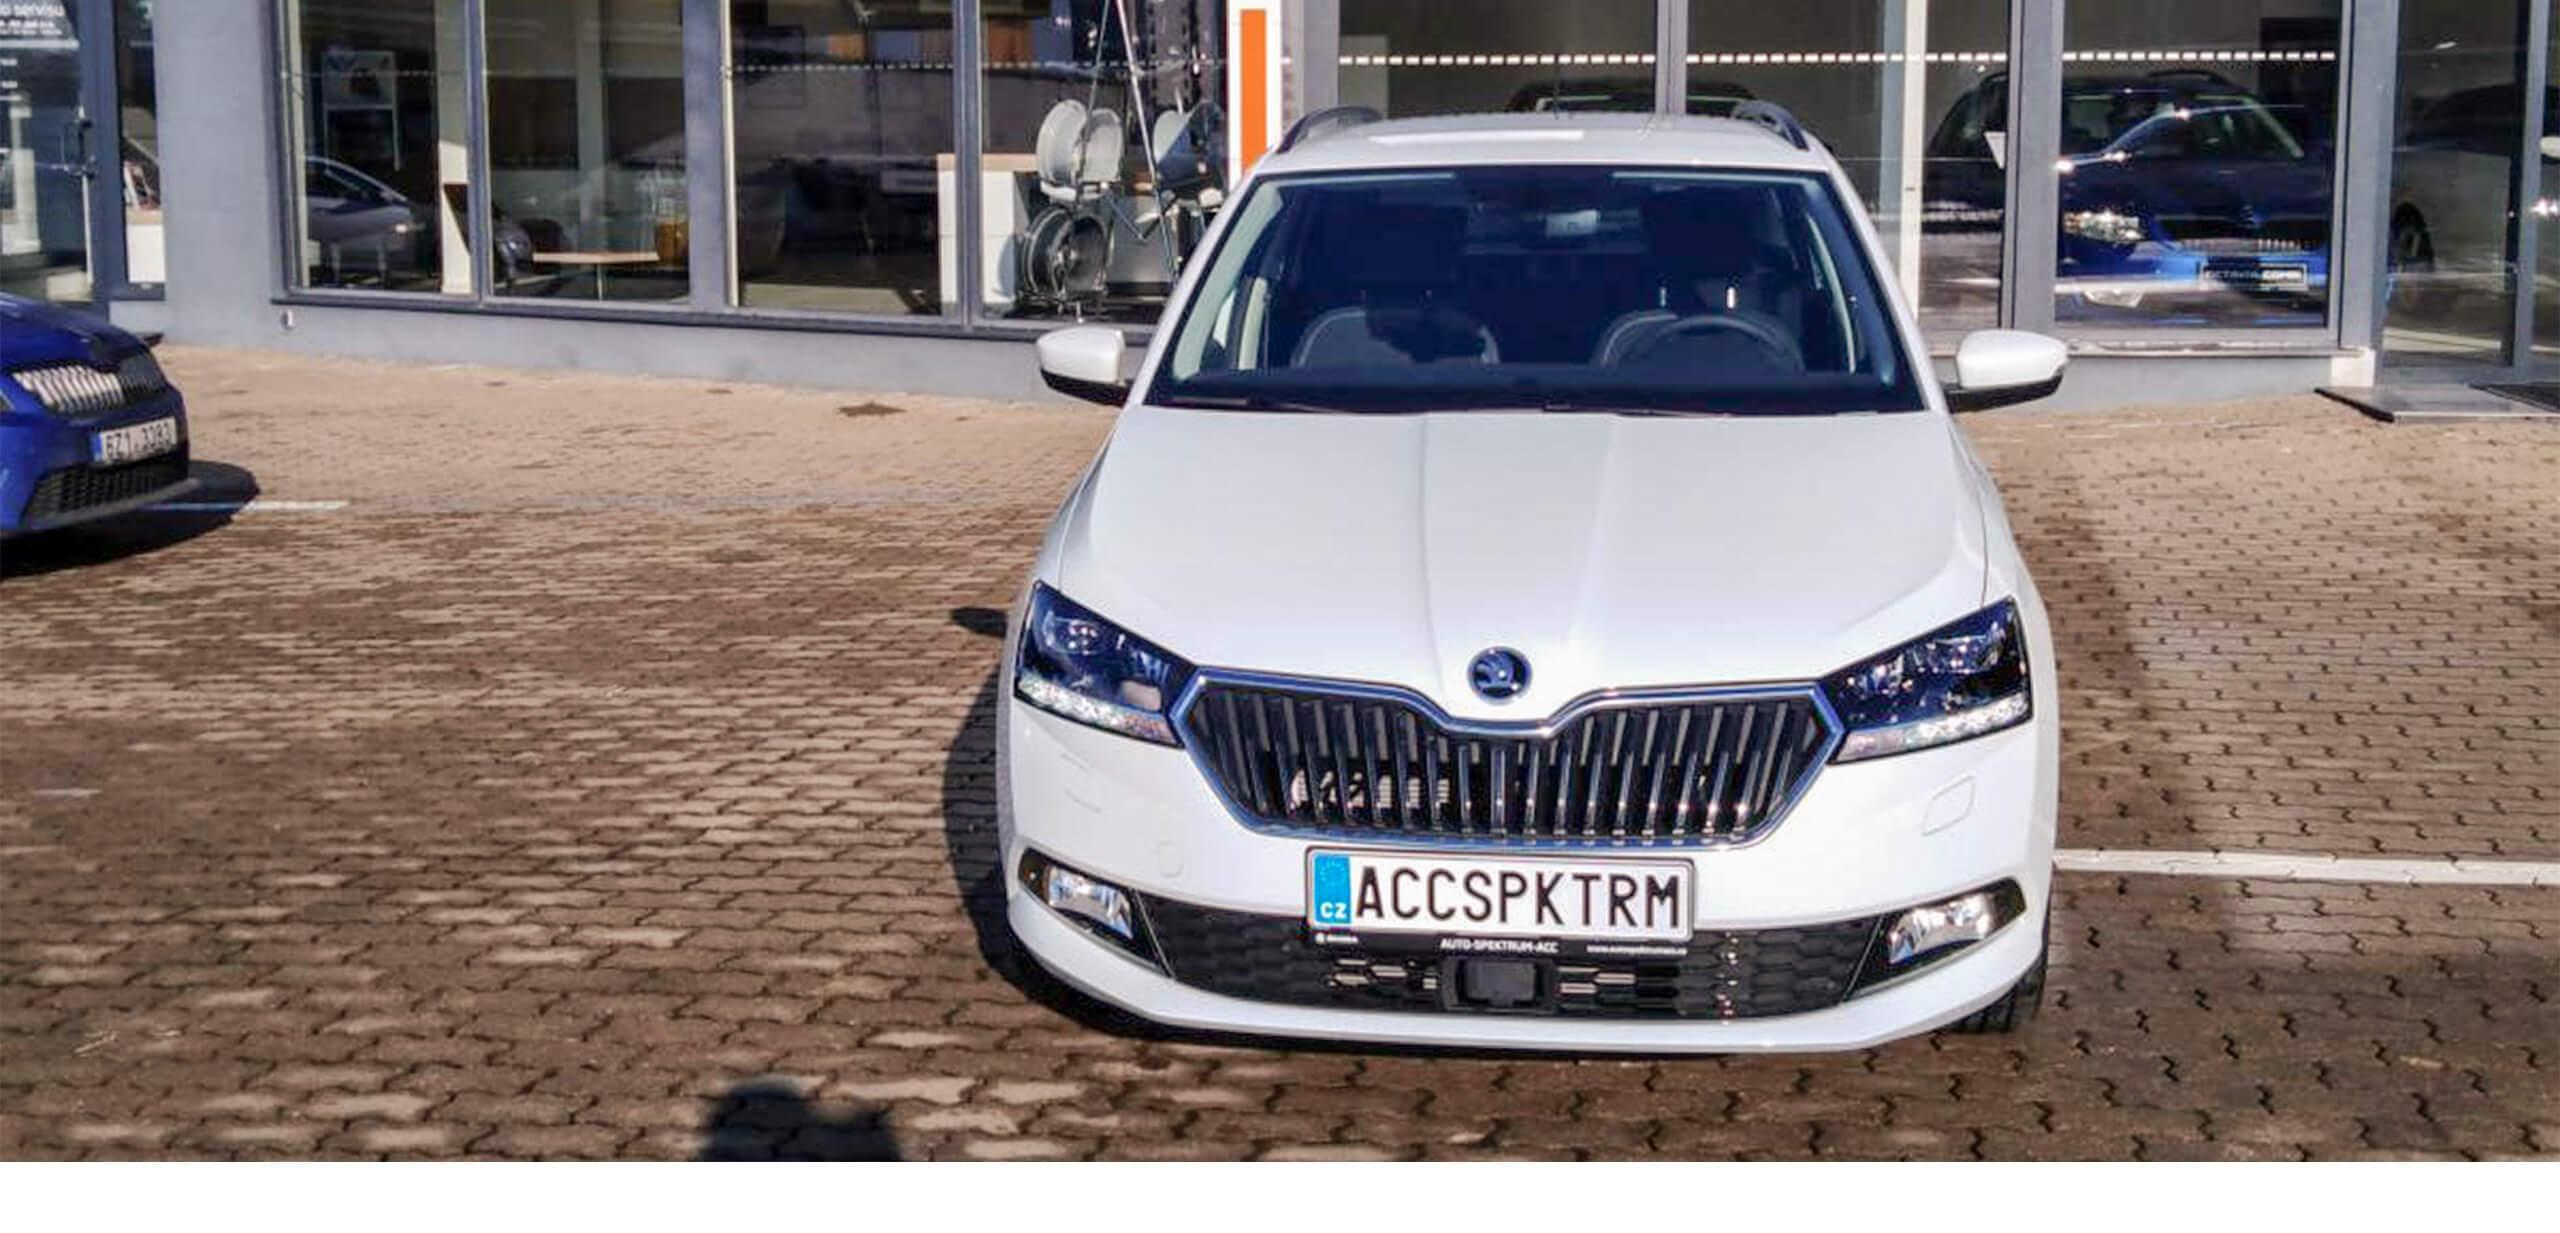 autospektrum acc Brno slatinaq Škoda Fabia COMBI 1.0TSI/70kW STYLE PLUS